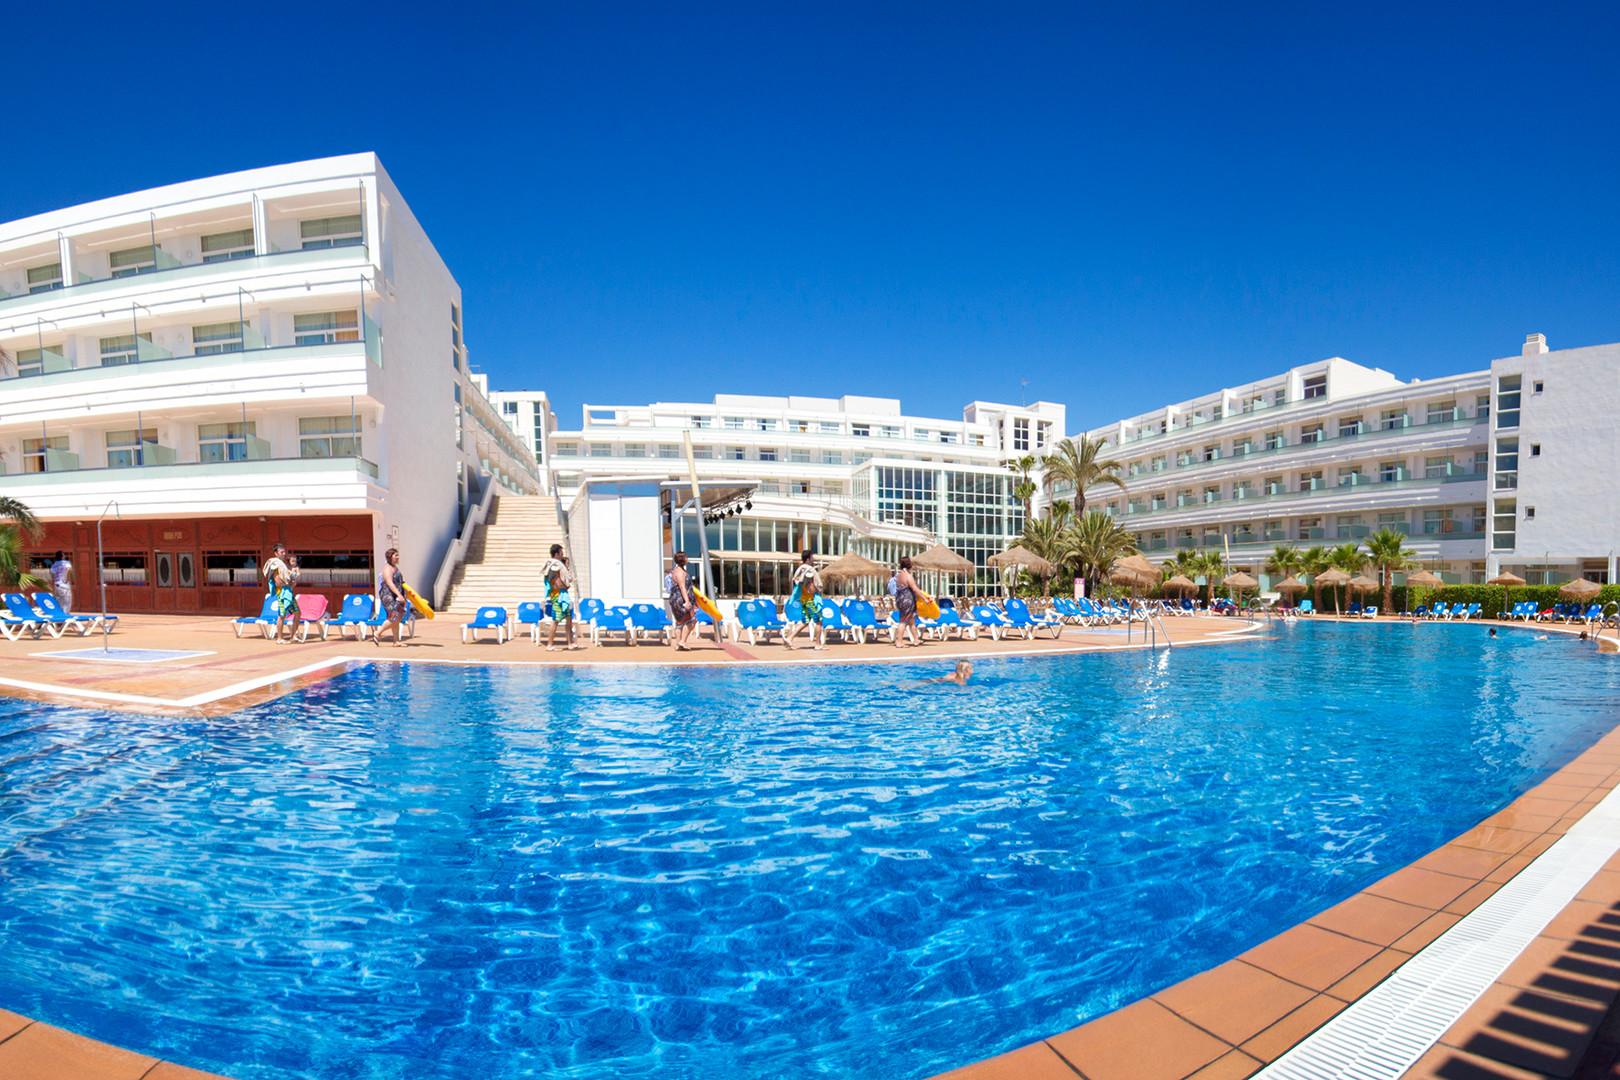 Piscine de l'hôtel Marina Playa - Marina Playa Hotel zwembad